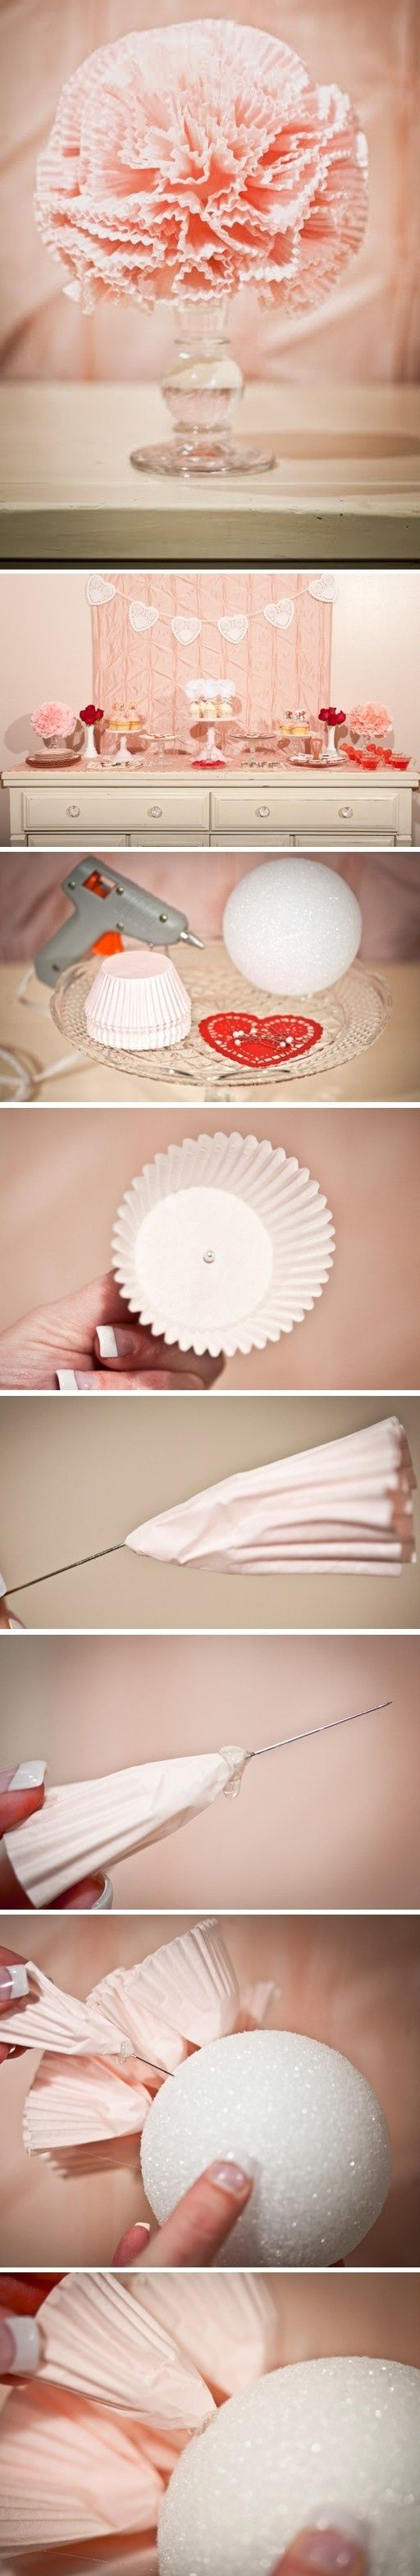 beautiful piece made of cupcake liners - Homemade - Handmade  - DYI - Craft - Nice Idea - Party Idea